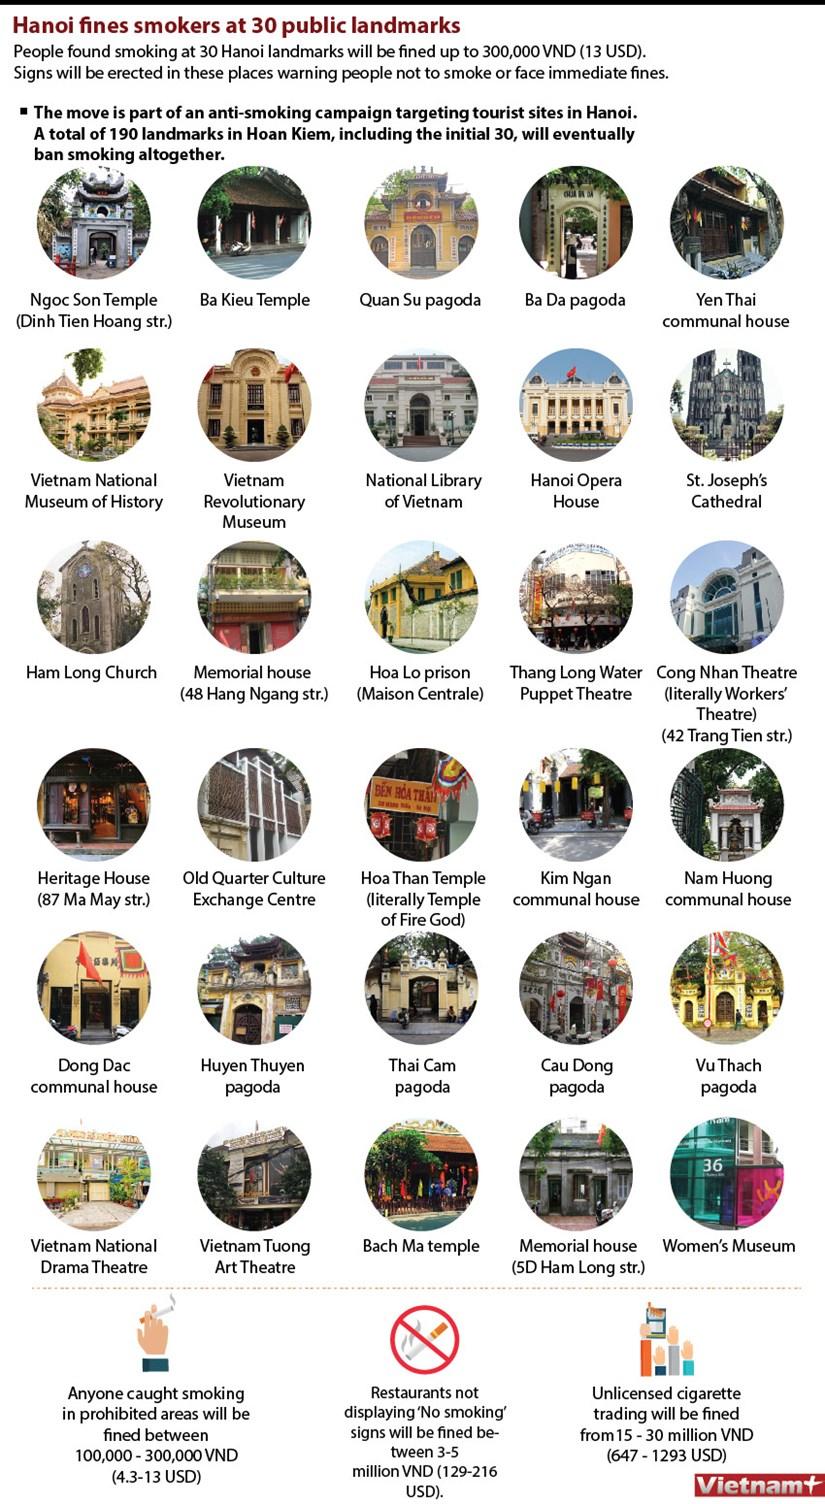 Hanoi fines smokers at 30 public landmarks hinh anh 1